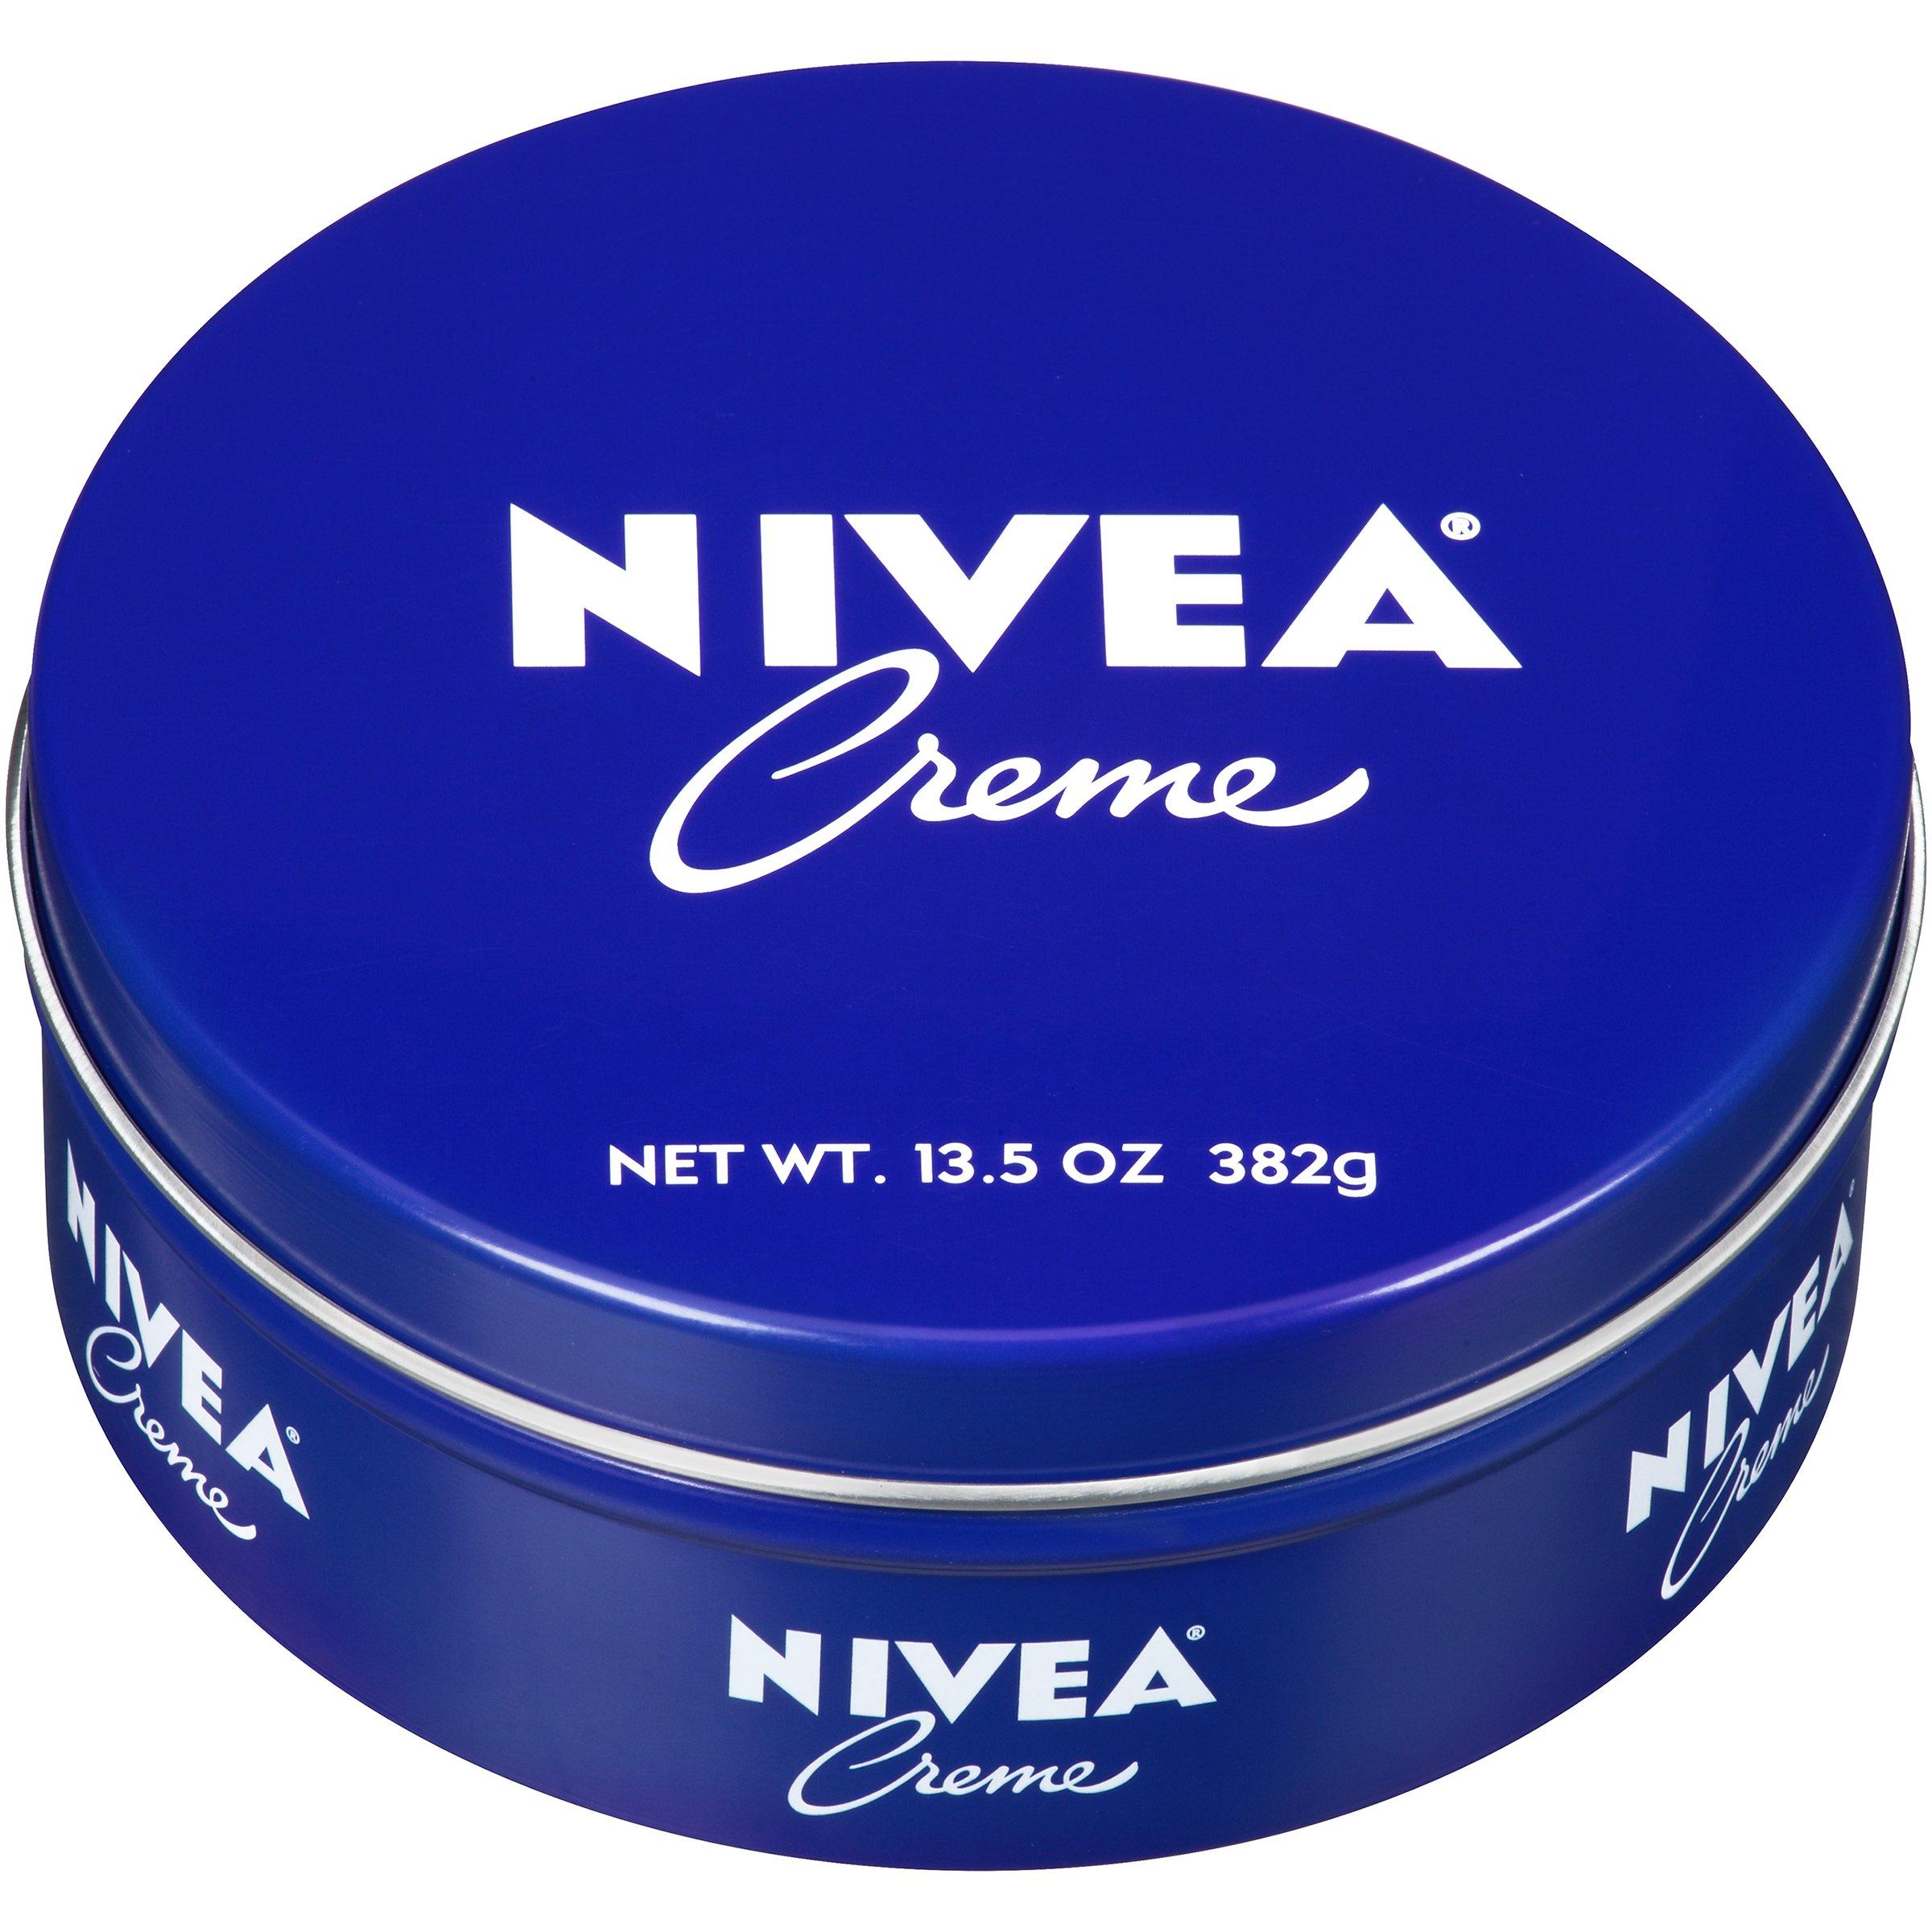 NIVEA Creme 13.5 Ounce